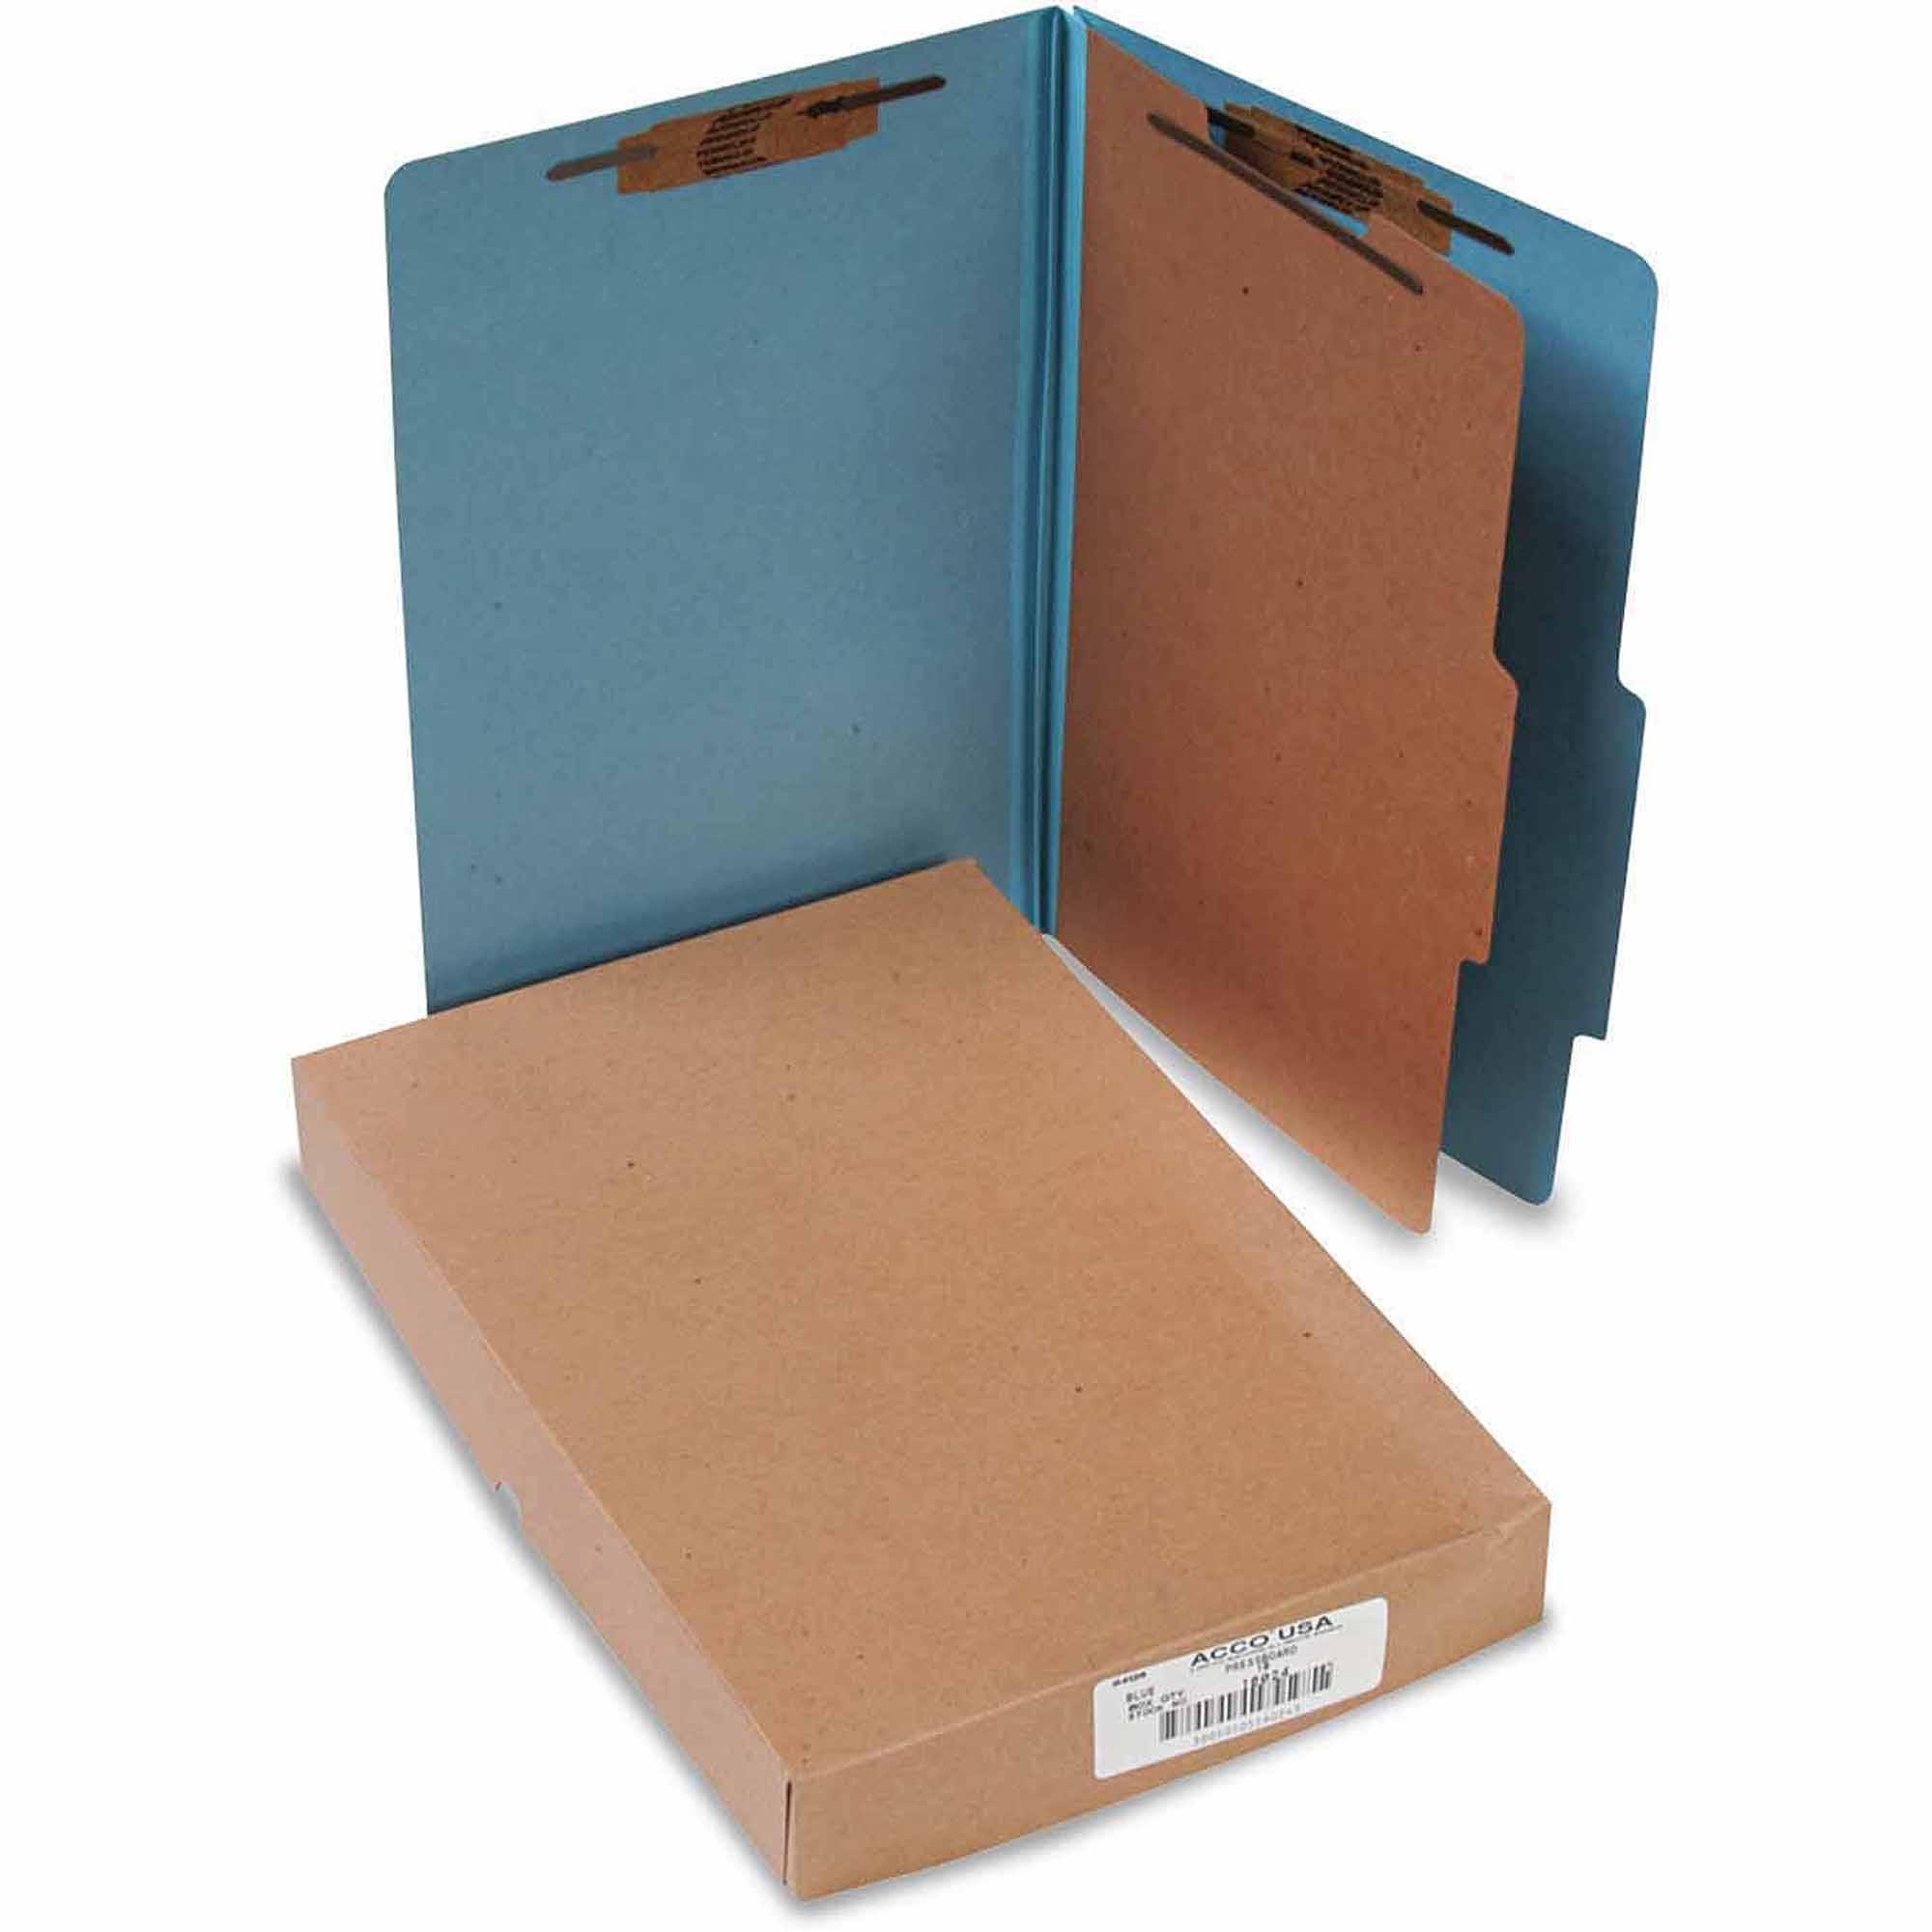 Pressboard 25-Pt Classification Folders, Legal, 4-Section, Sky Blue, 10/Box